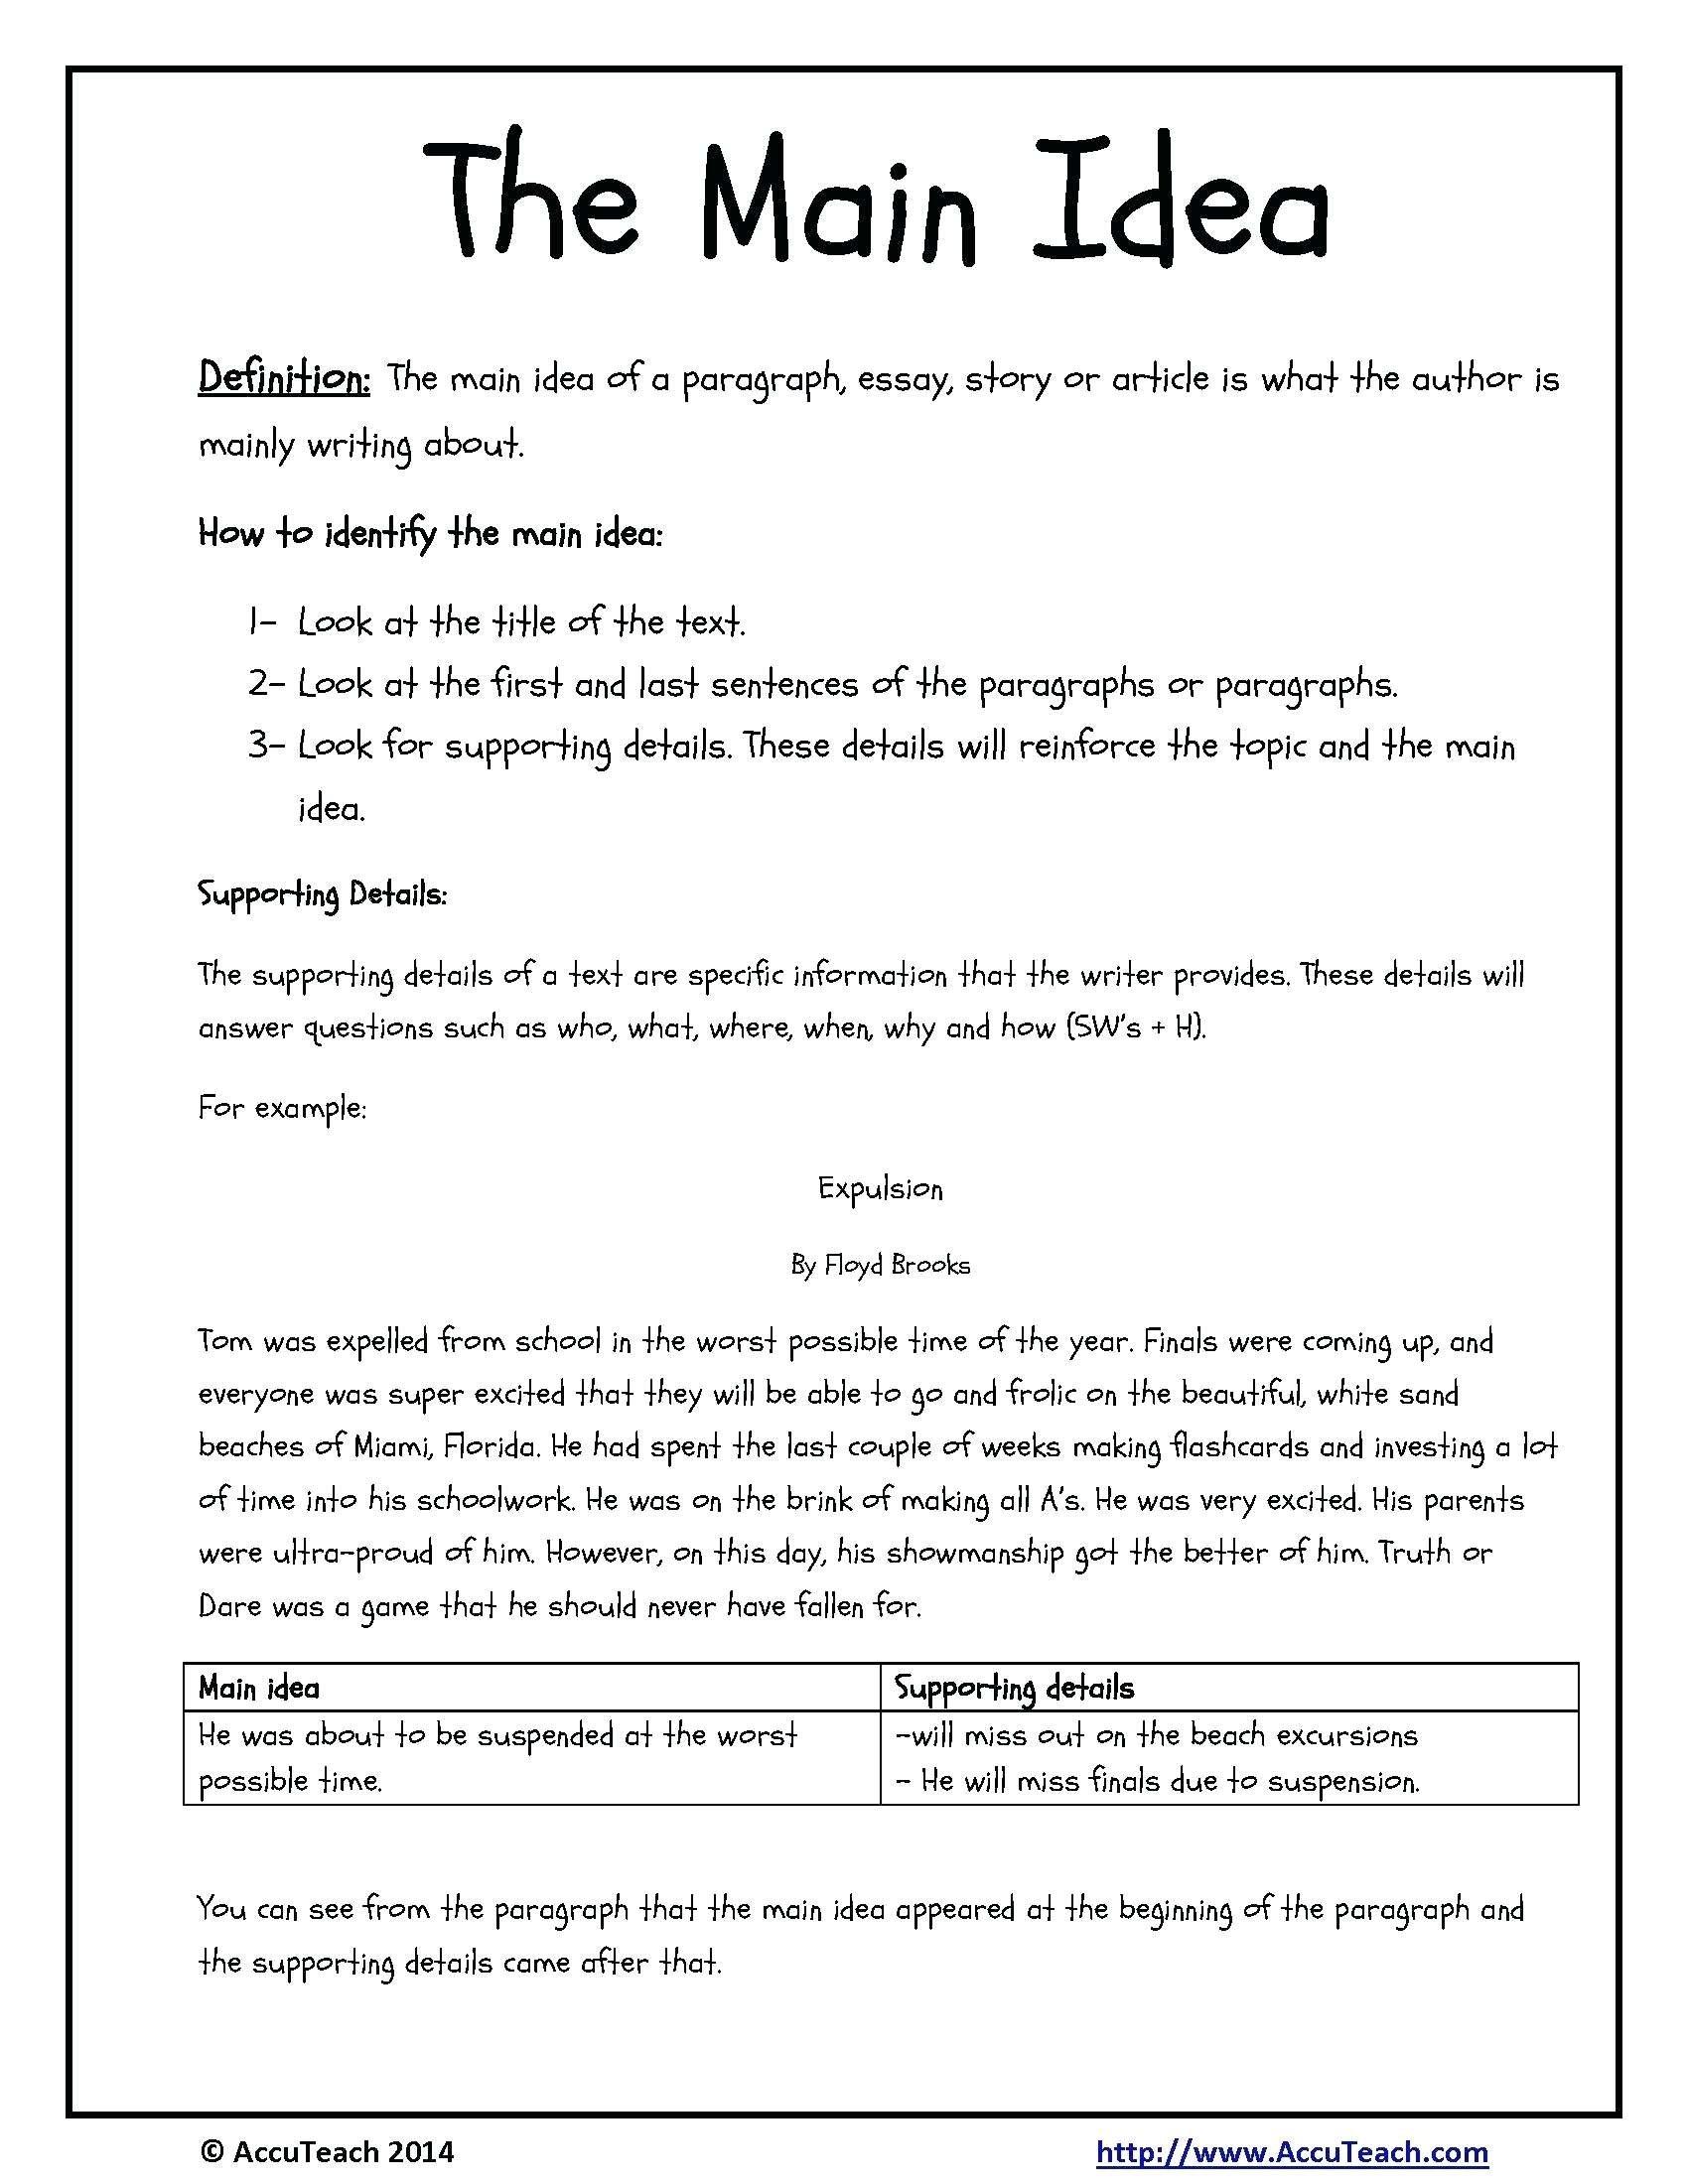 10 Attractive Main Idea And Details Worksheets 3Rd Grade kindergarten worksheet multiple choice main idea worksheets free 9 2021